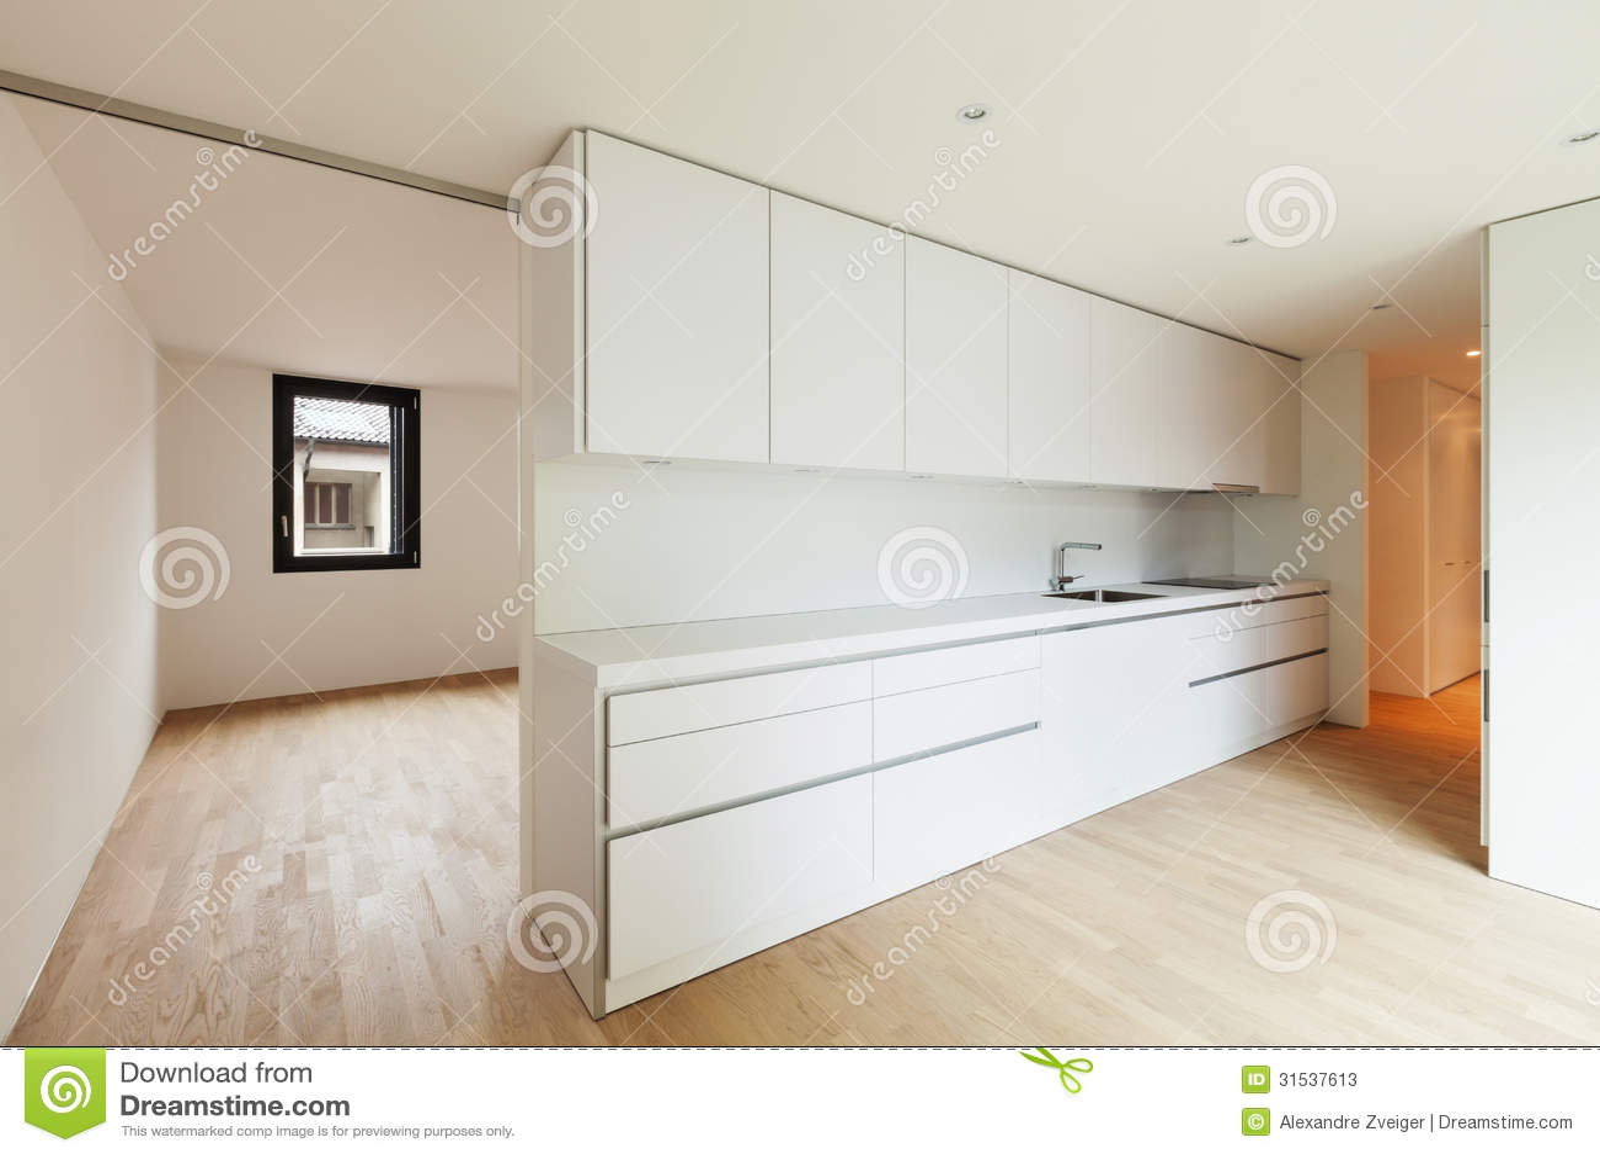 Cucina bianca moderna immagine stock immagine di spazio - Cucina bianca moderna ...